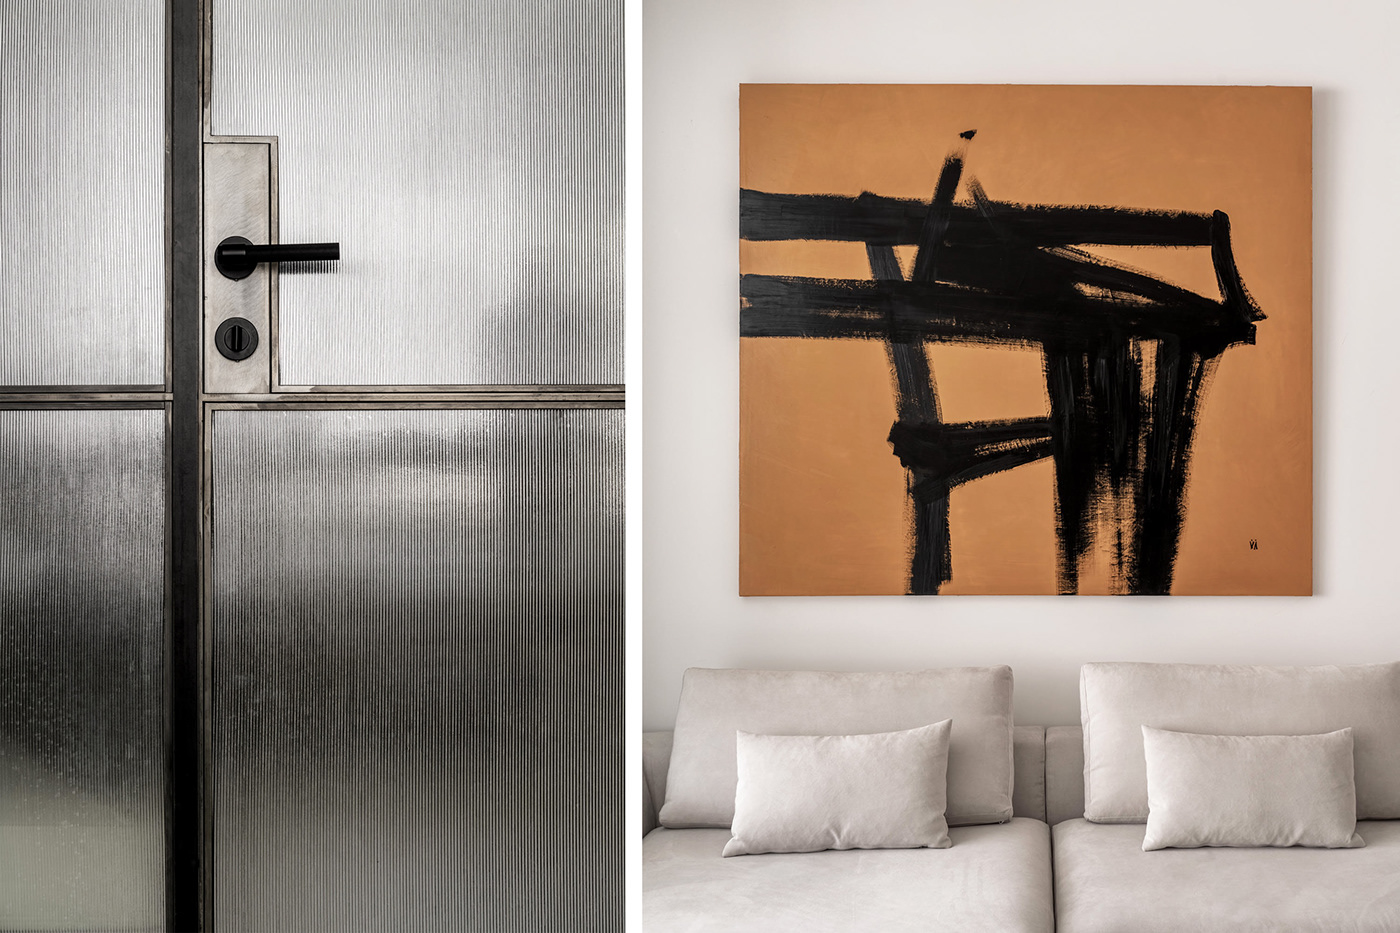 design form bureau gravitation Interior interiorlife interiorukraine minimalisminterior NordicInterior ukraine Vika Shkliar